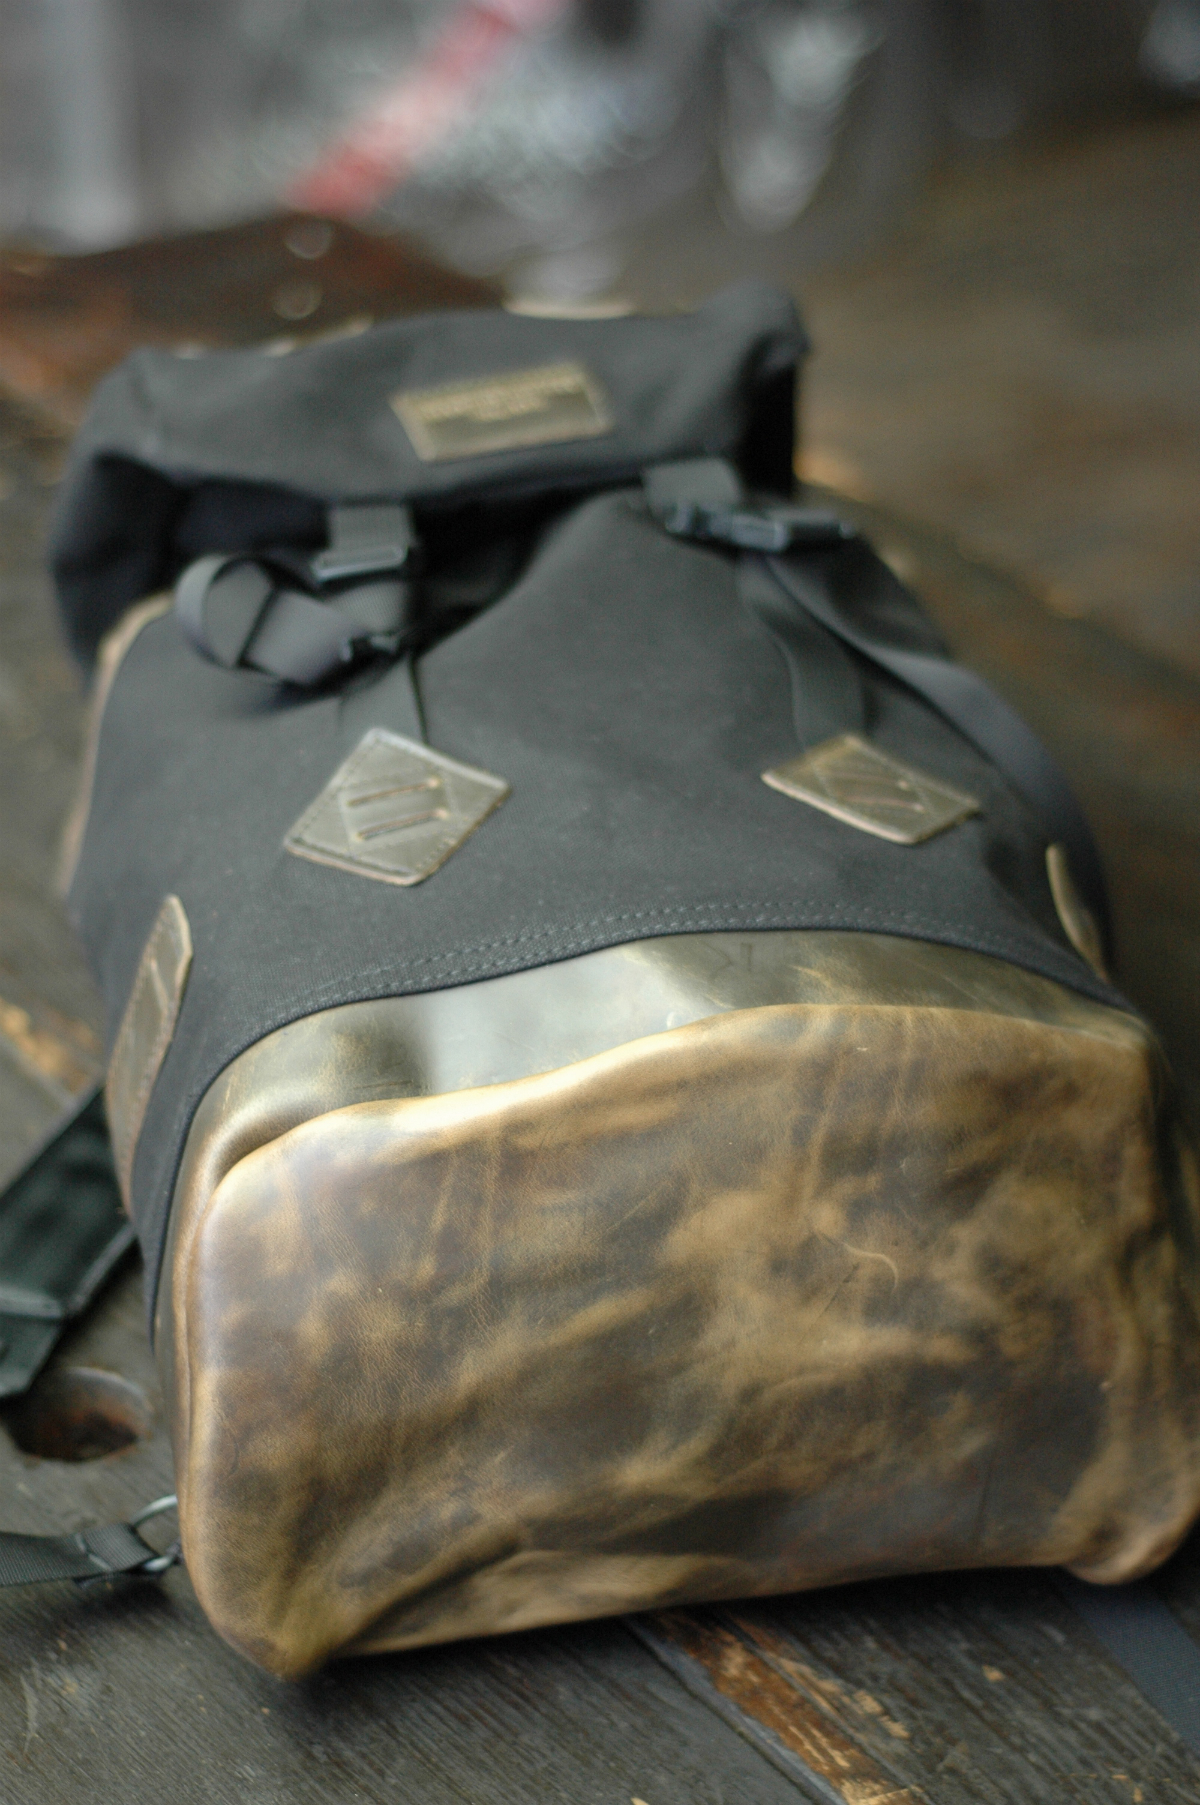 Рюкзак Altadena Works с базой из кожи Chromexcel от Horween